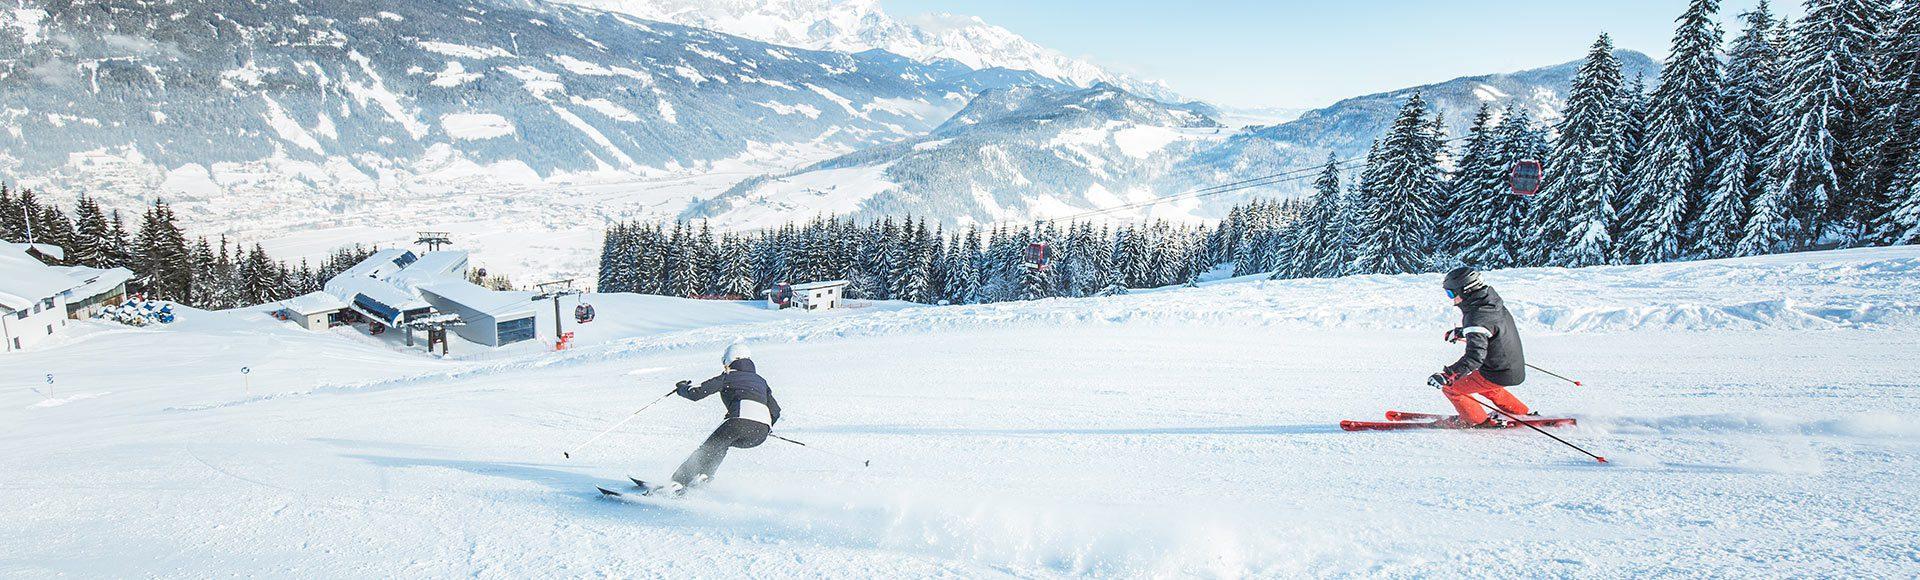 Schneegarantie Kurz Pauschale